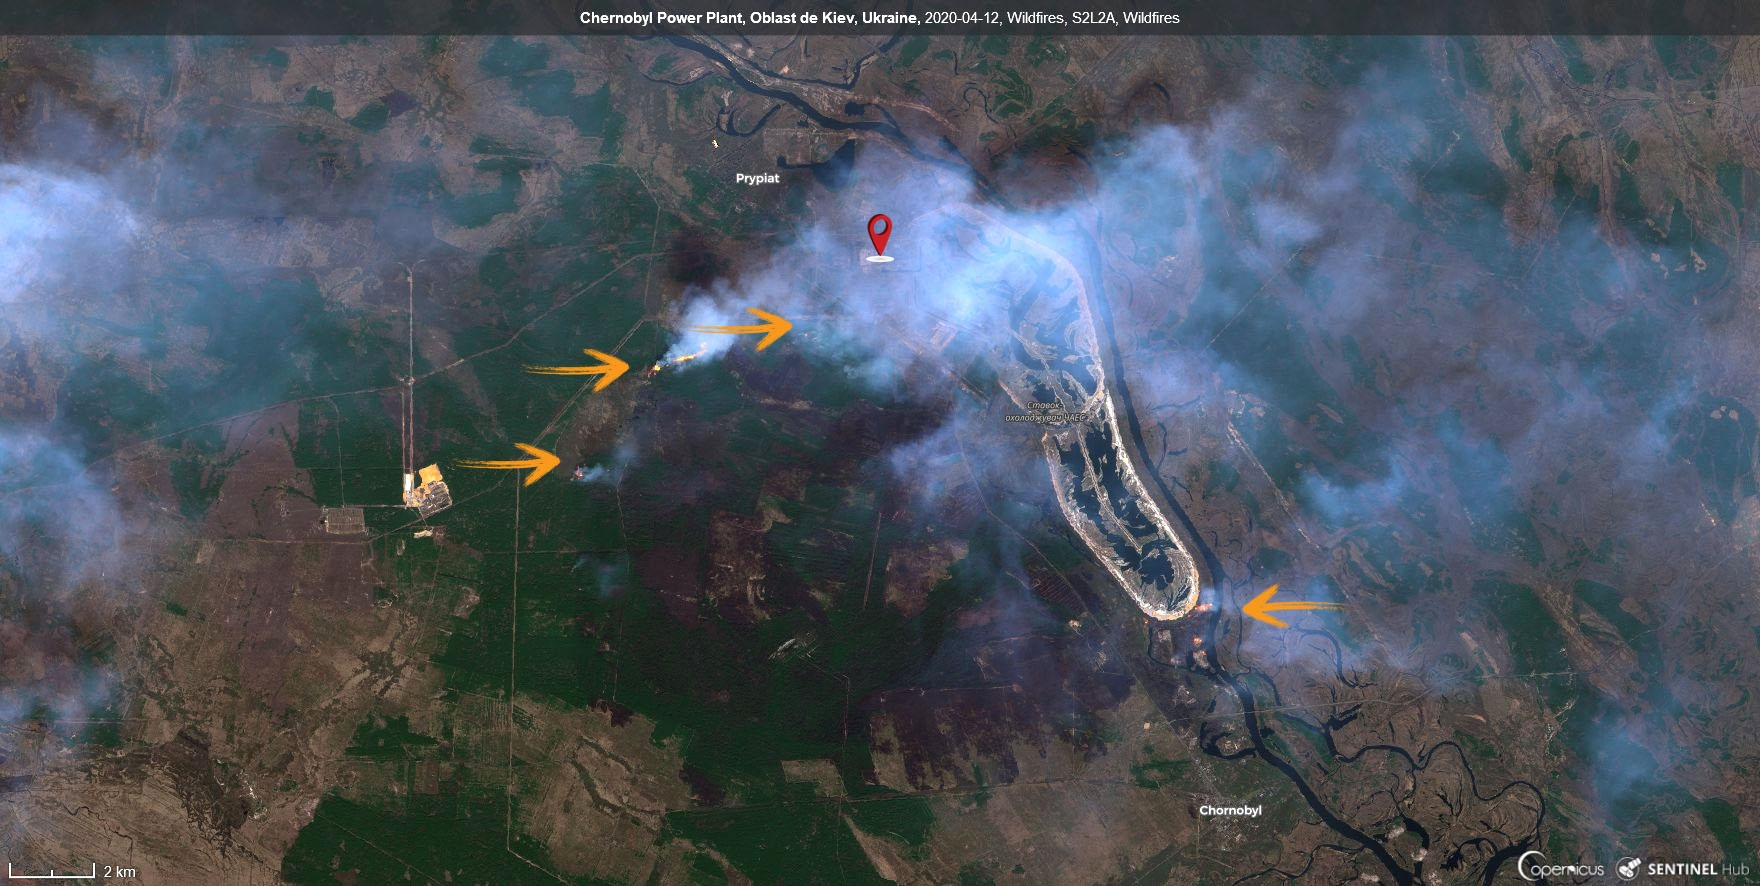 em-tchernobyl-2020-04-12-wildfires-s2l2a-leg.jpg